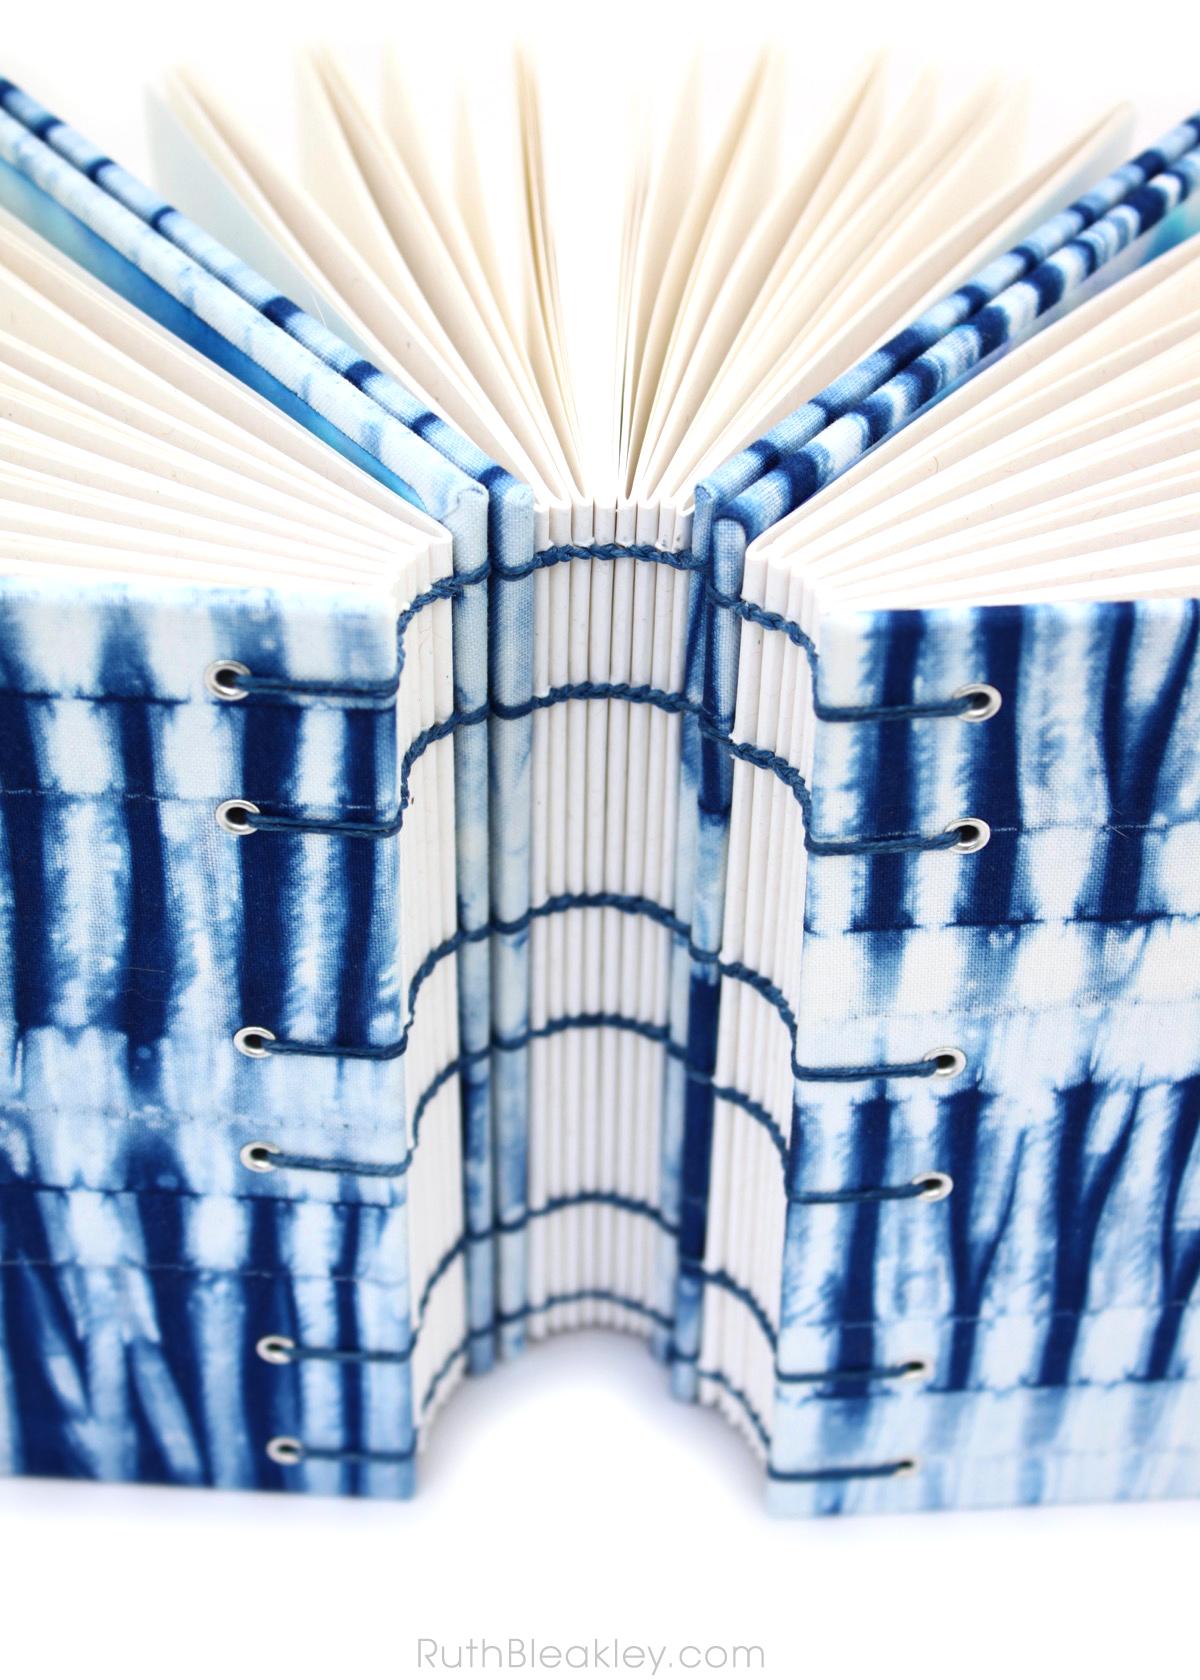 Indigo Shibori Journal handmade by book artist Ruth Bleakley with fabric from Cape Cod Shibori - 12